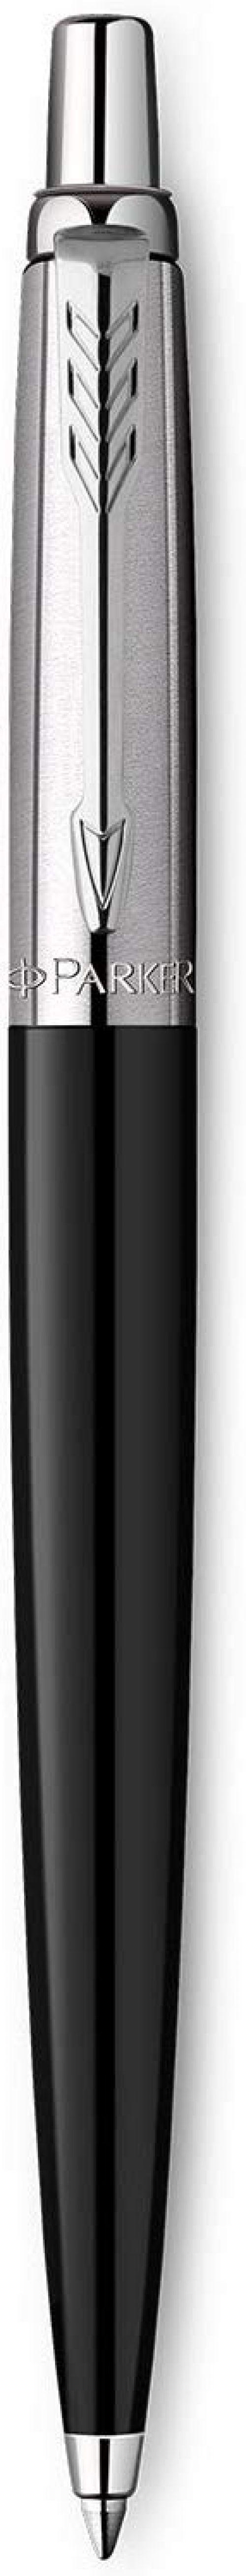 Parker Jotter Original Ball Point Pen Black Medium Blue Ink 2096873